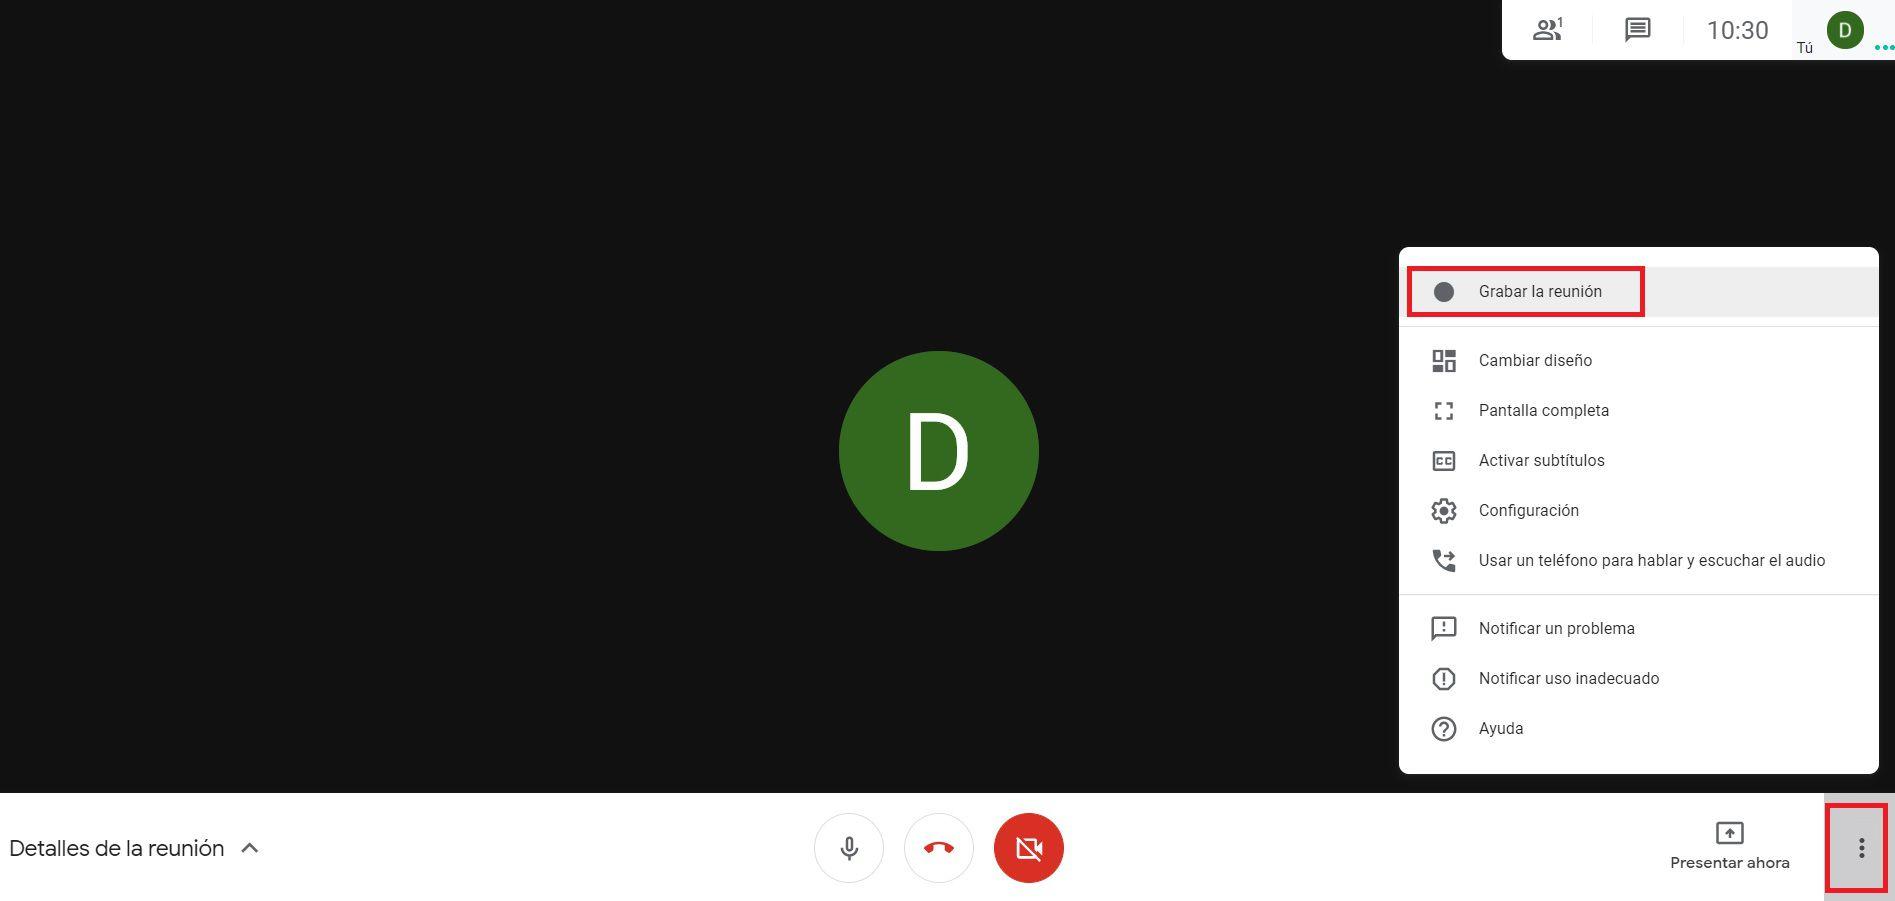 Cómo grabar en Google Meet